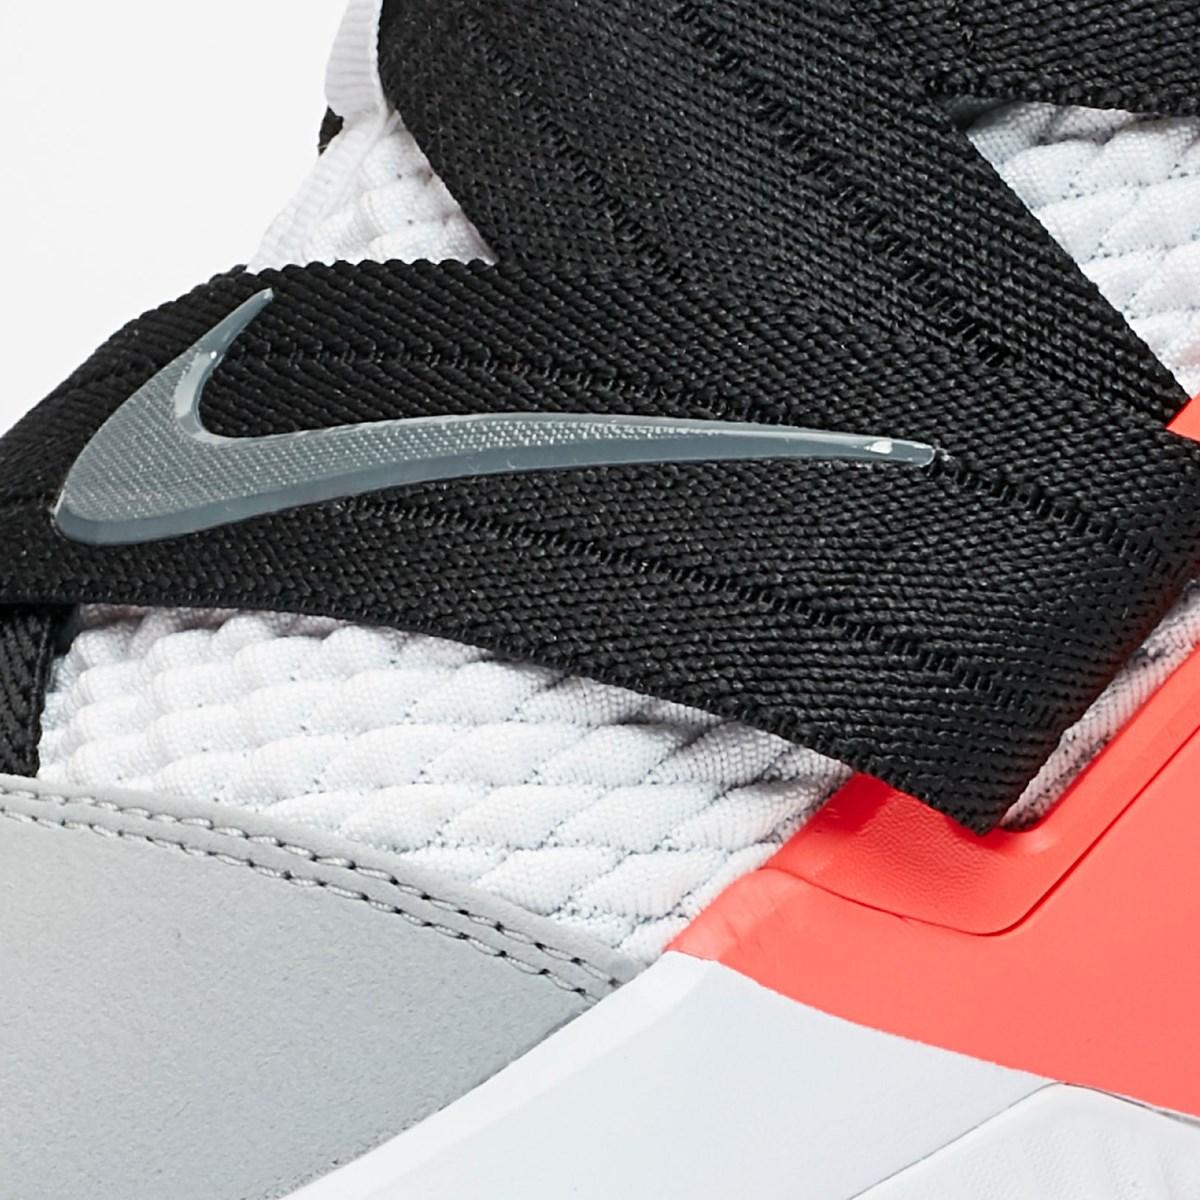 4b7c9895039d2 Nike LeBron Soldier XII SFG - Ao4054-102 - Sneakersnstuff